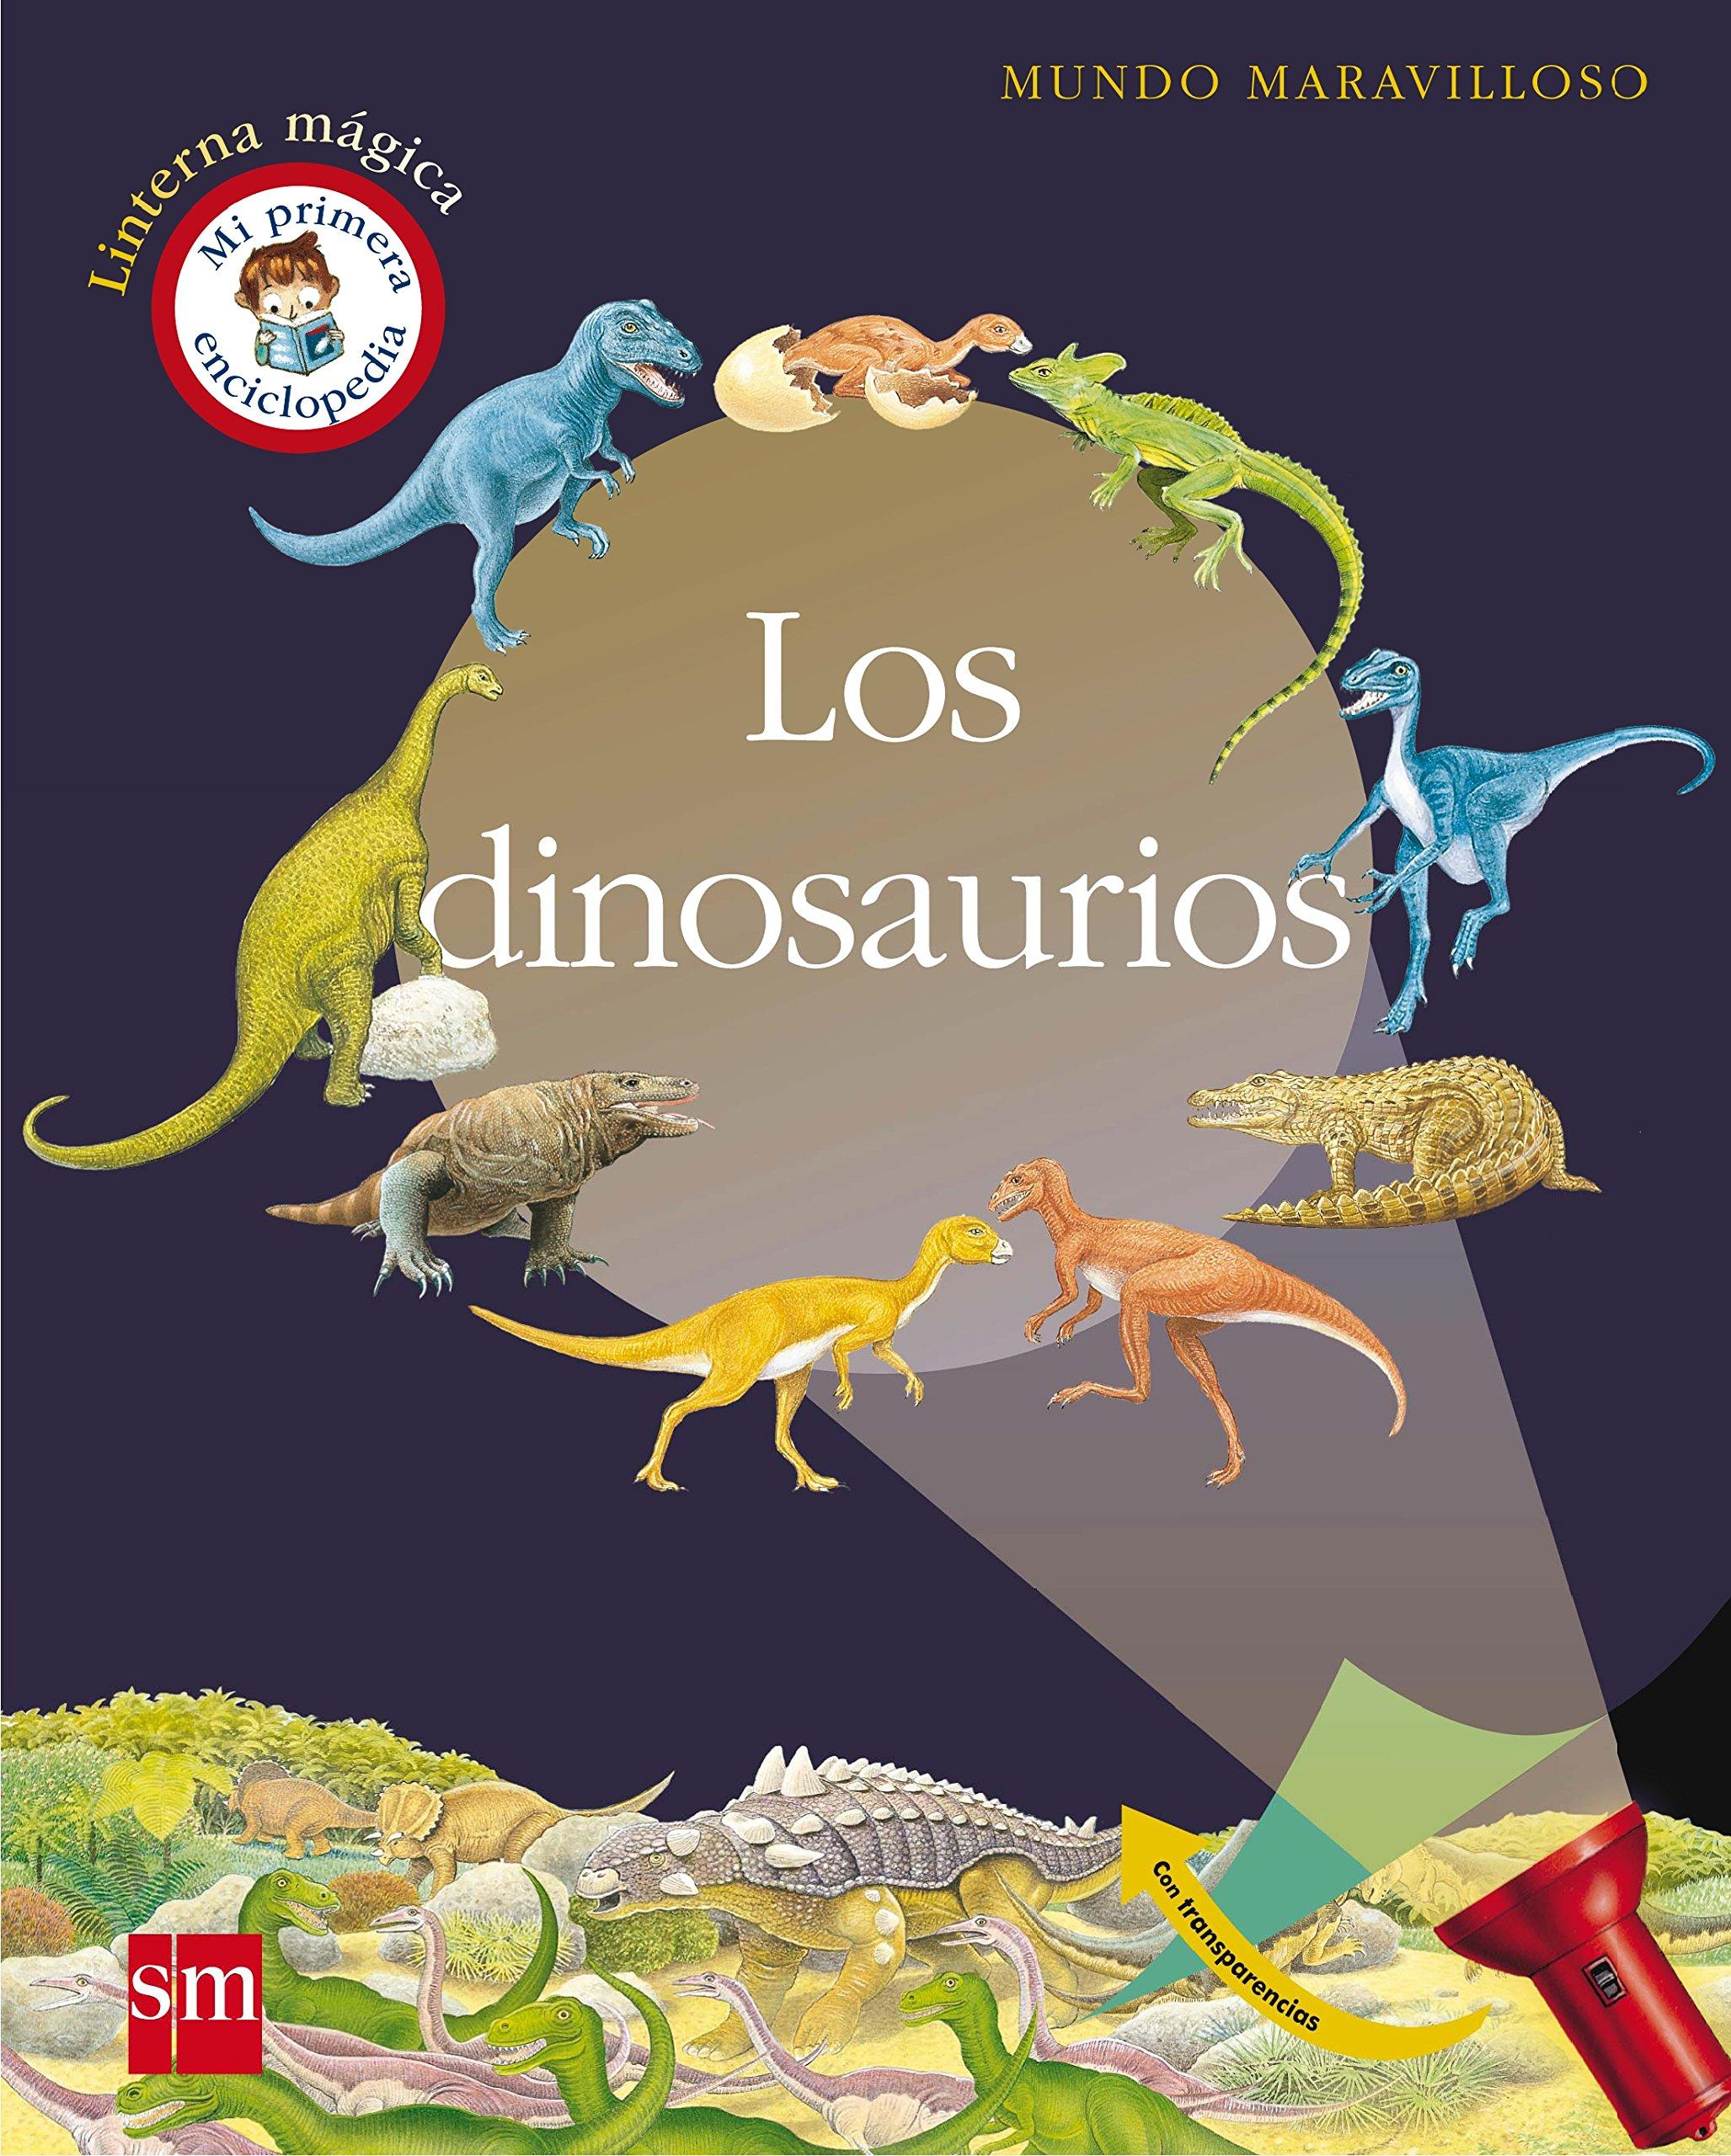 Los dinosaurios (Mundo maravilloso): Amazon.es: Badreddine, Delphine,  Grant, Donald, Galeron, Henri, Hugo, Pierre de, Fuhr, Ute, Sautai, Raoul,  Prunier, James, Bort Misol, Fernando: Libros